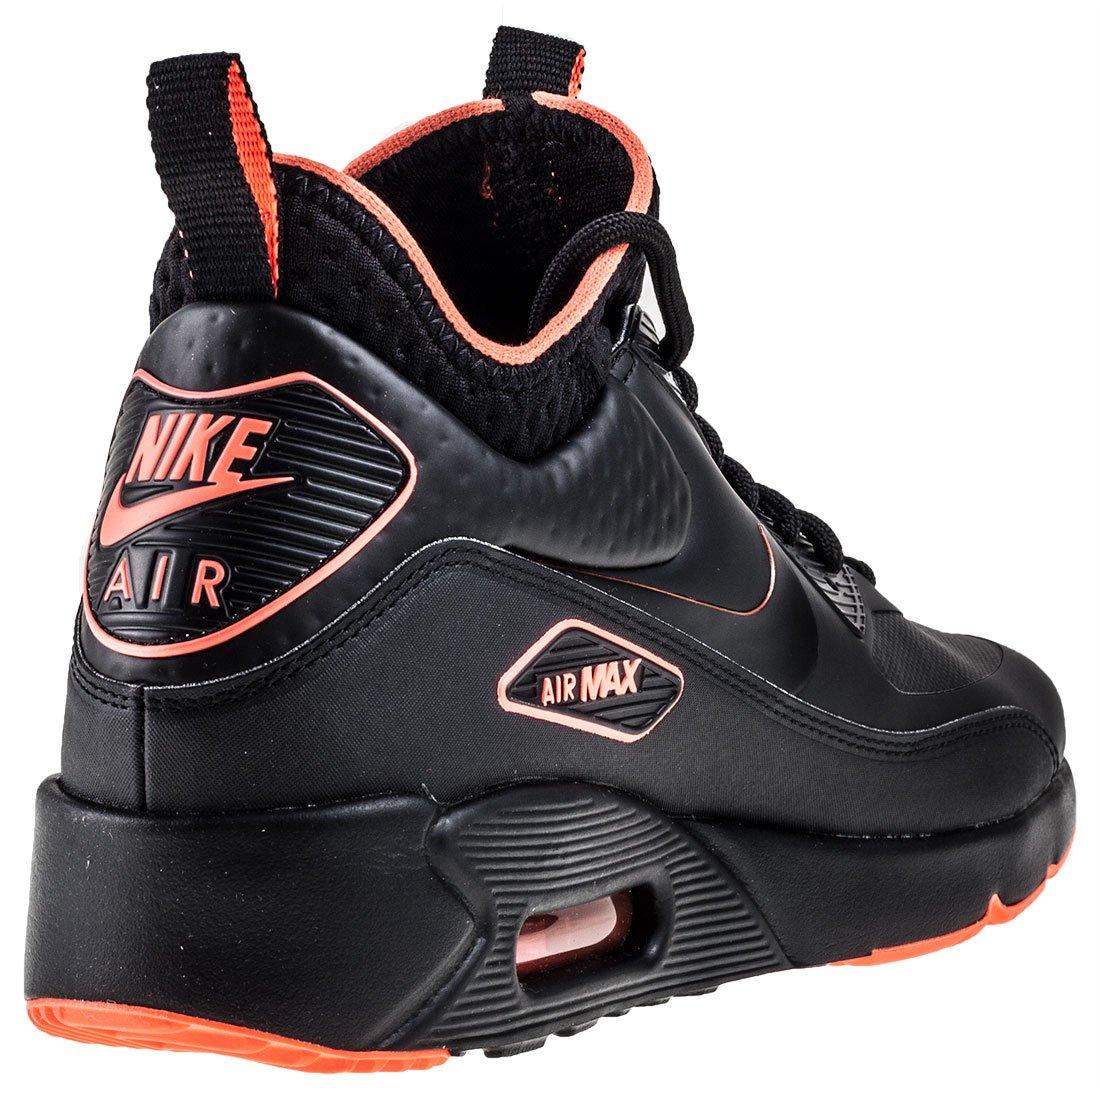 Nike Air Max 90 Ultra Mid Winter SE Nere Scarpe AA4423 001